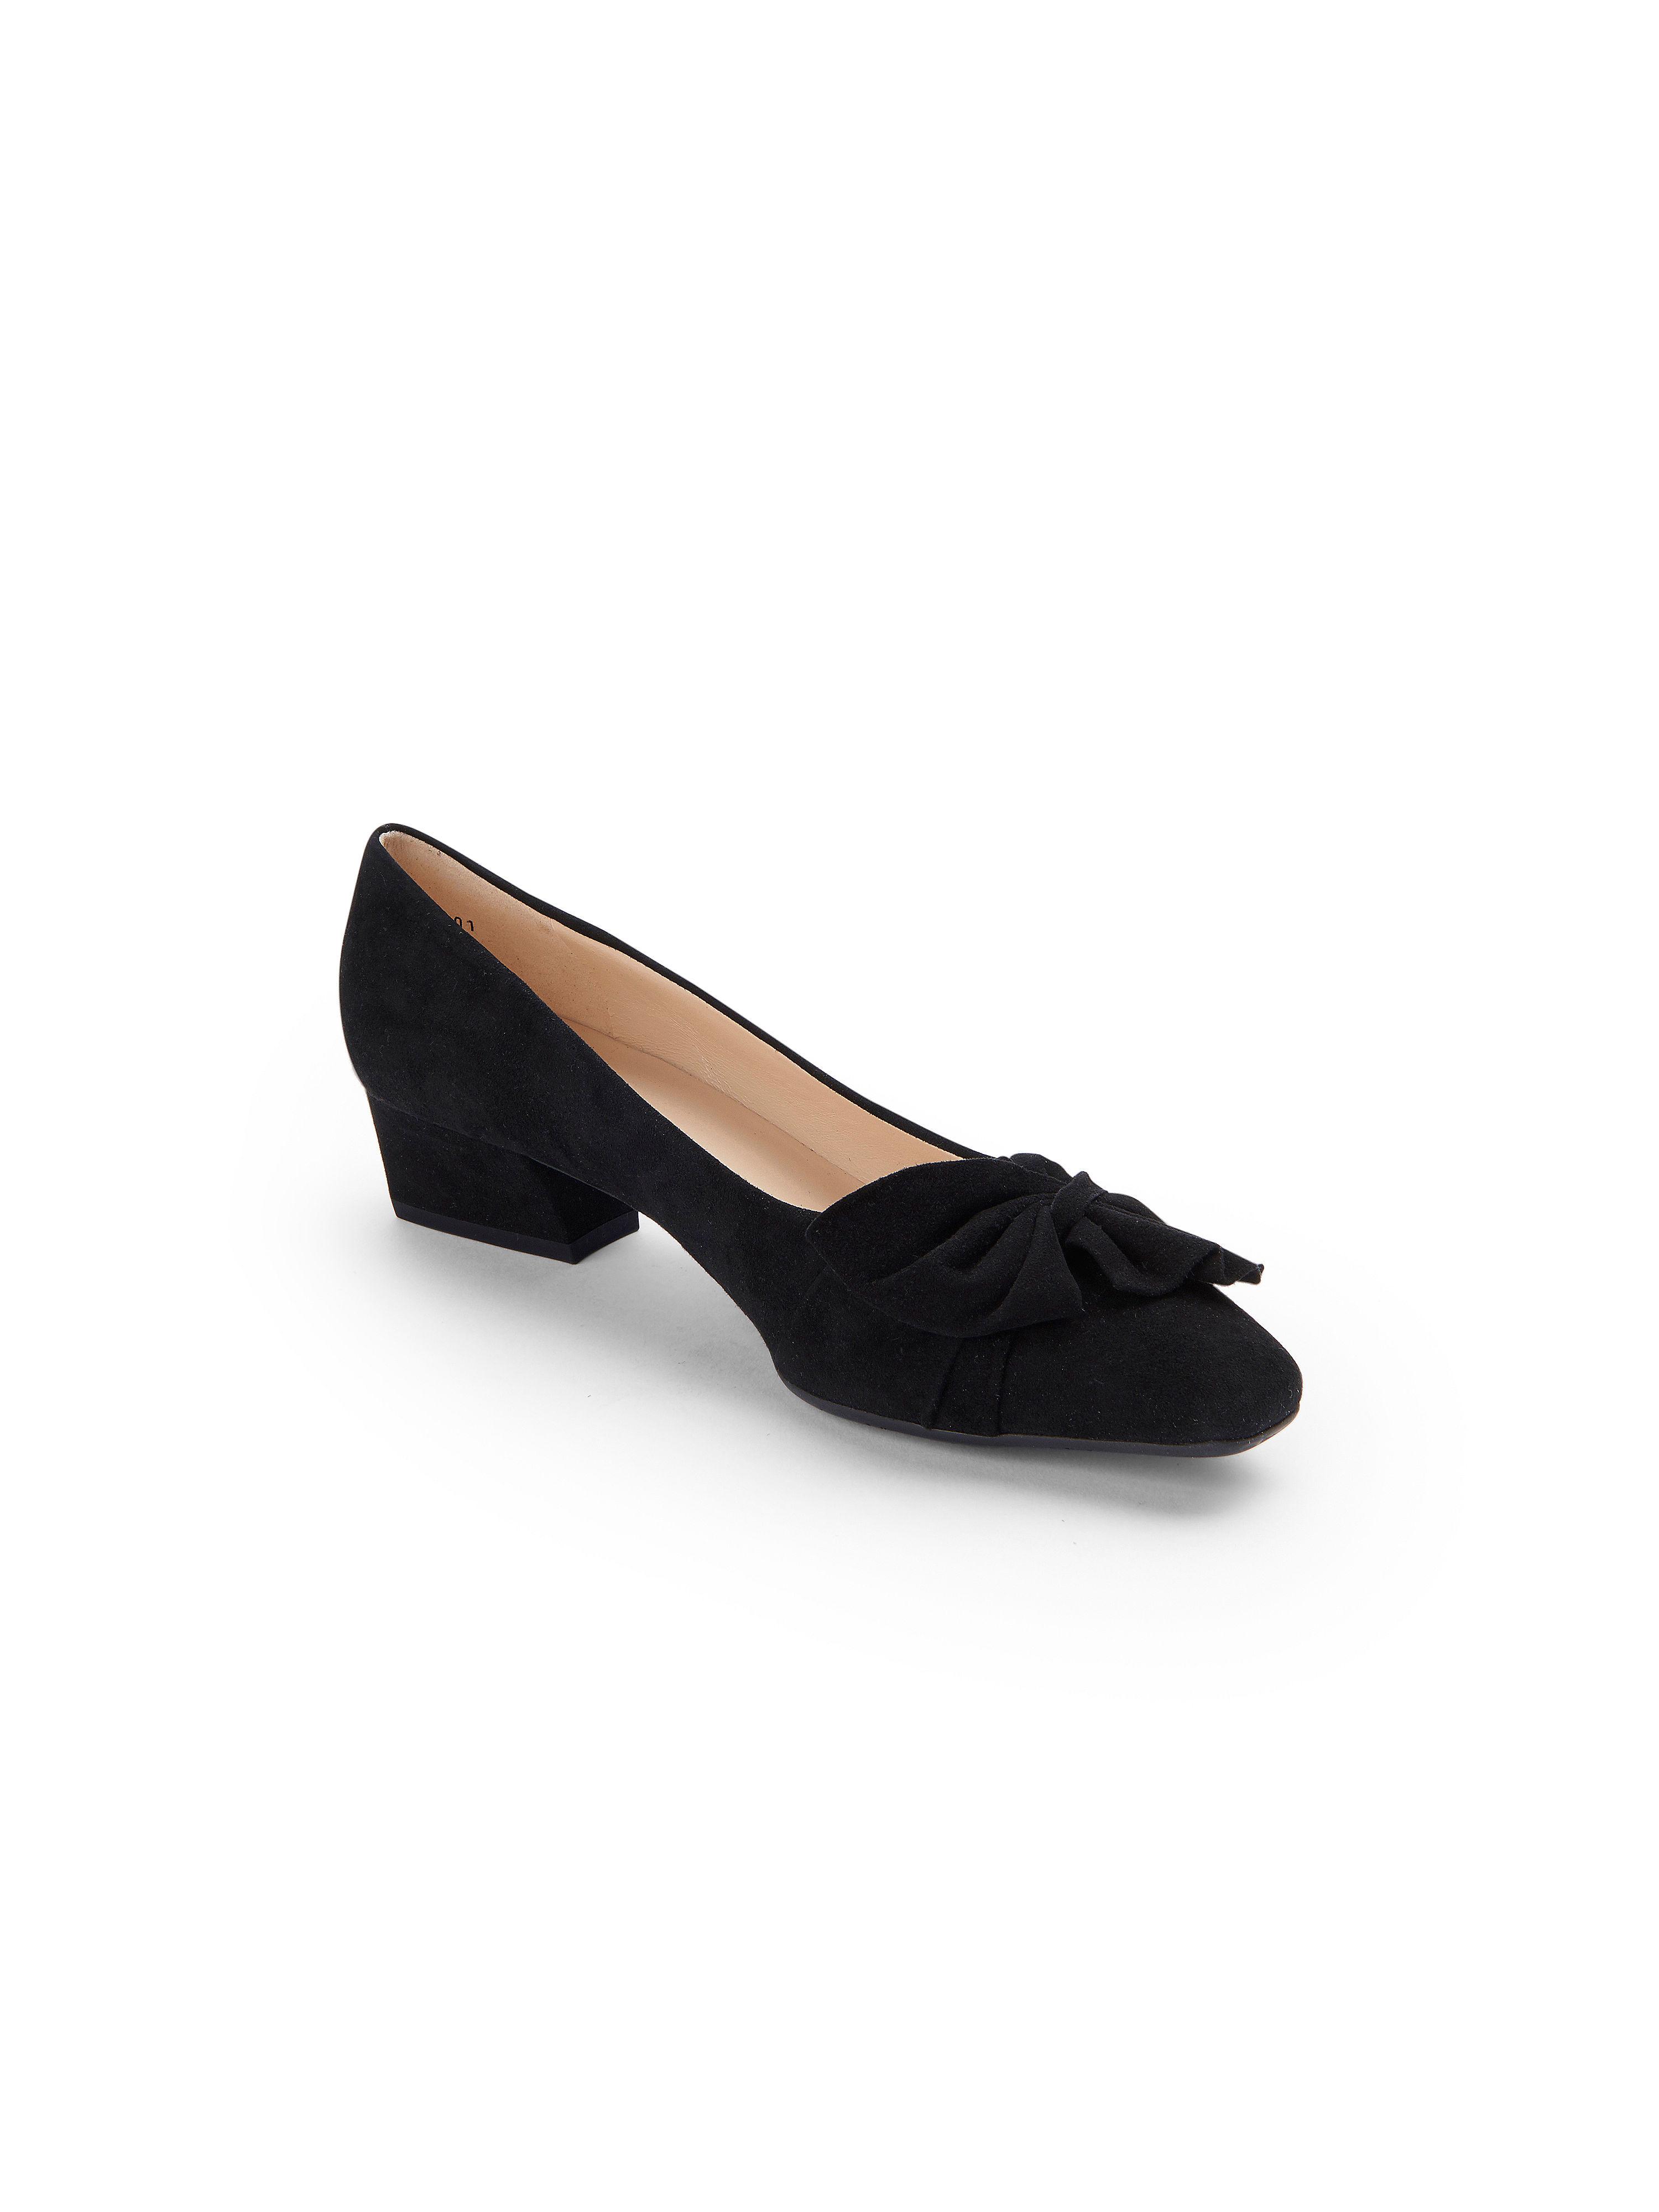 Peter Kaiser - Pumps Indora - Schuhe Schwarz Gute Qualität beliebte Schuhe - 45c4ee